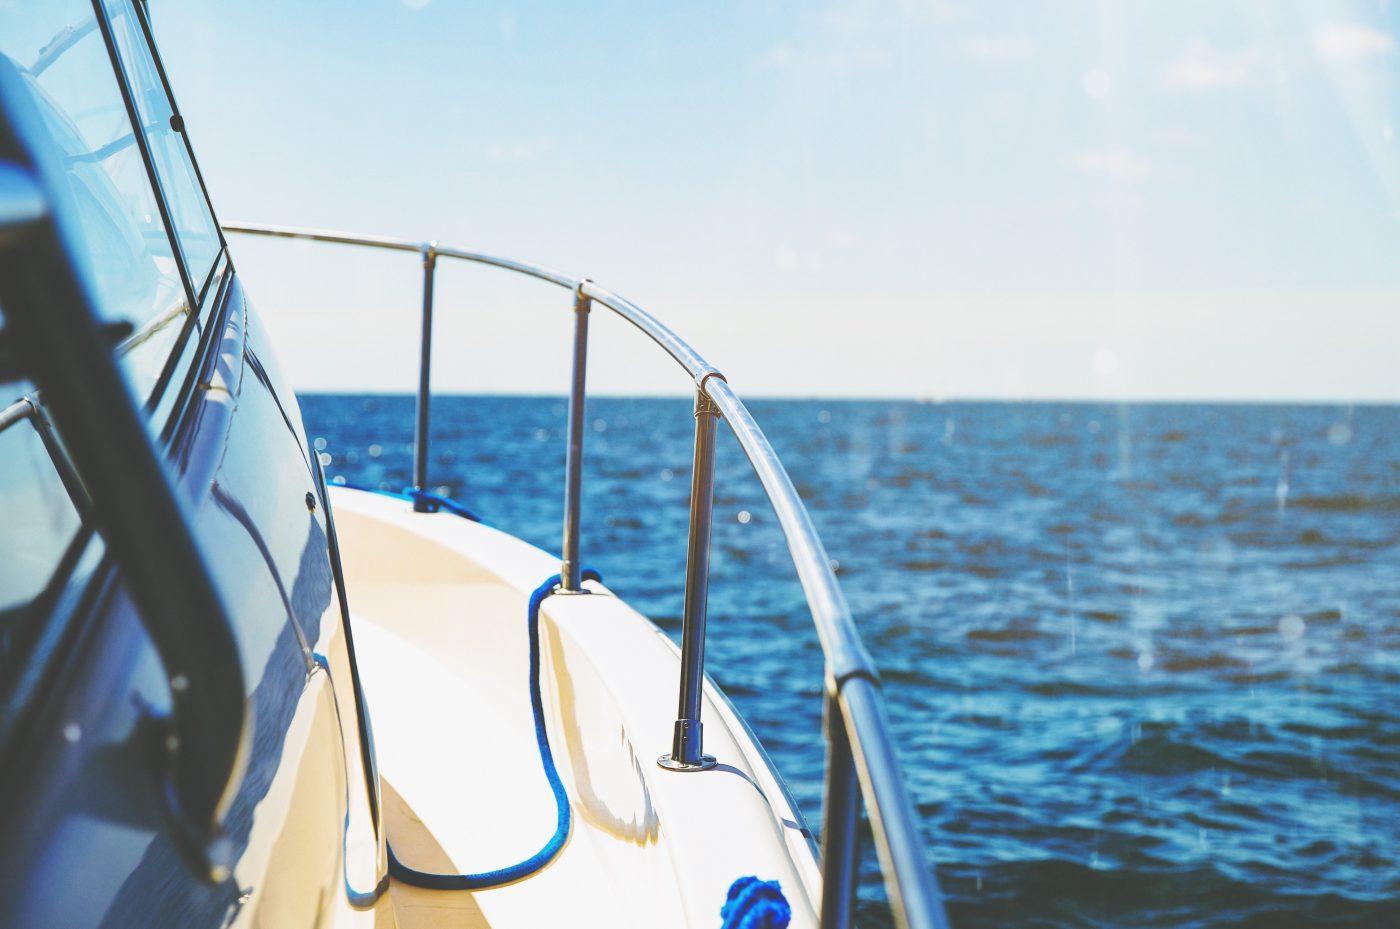 Transfert d'embarcation entre particuliers avec Transport Canada